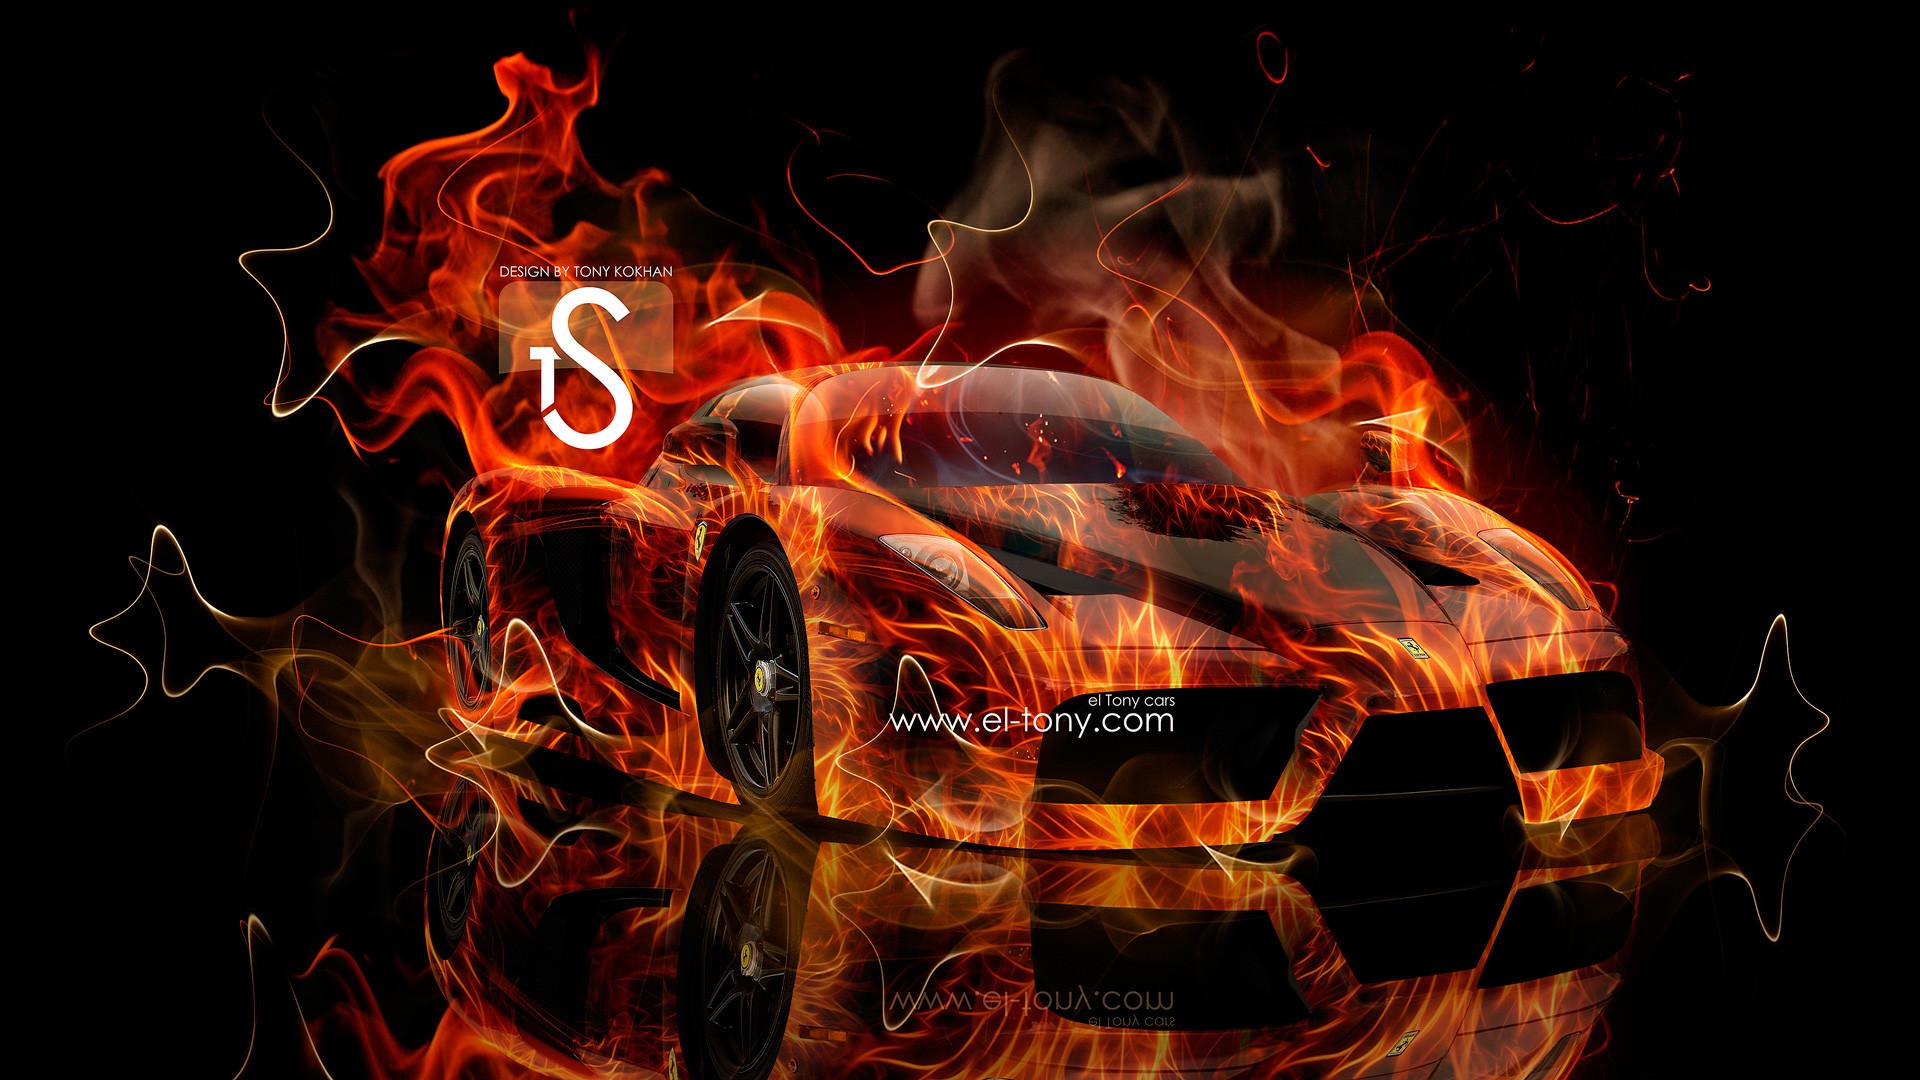 Ferrari-Enzo-Fire-Car-2013-Abstract-Smoke-HD-